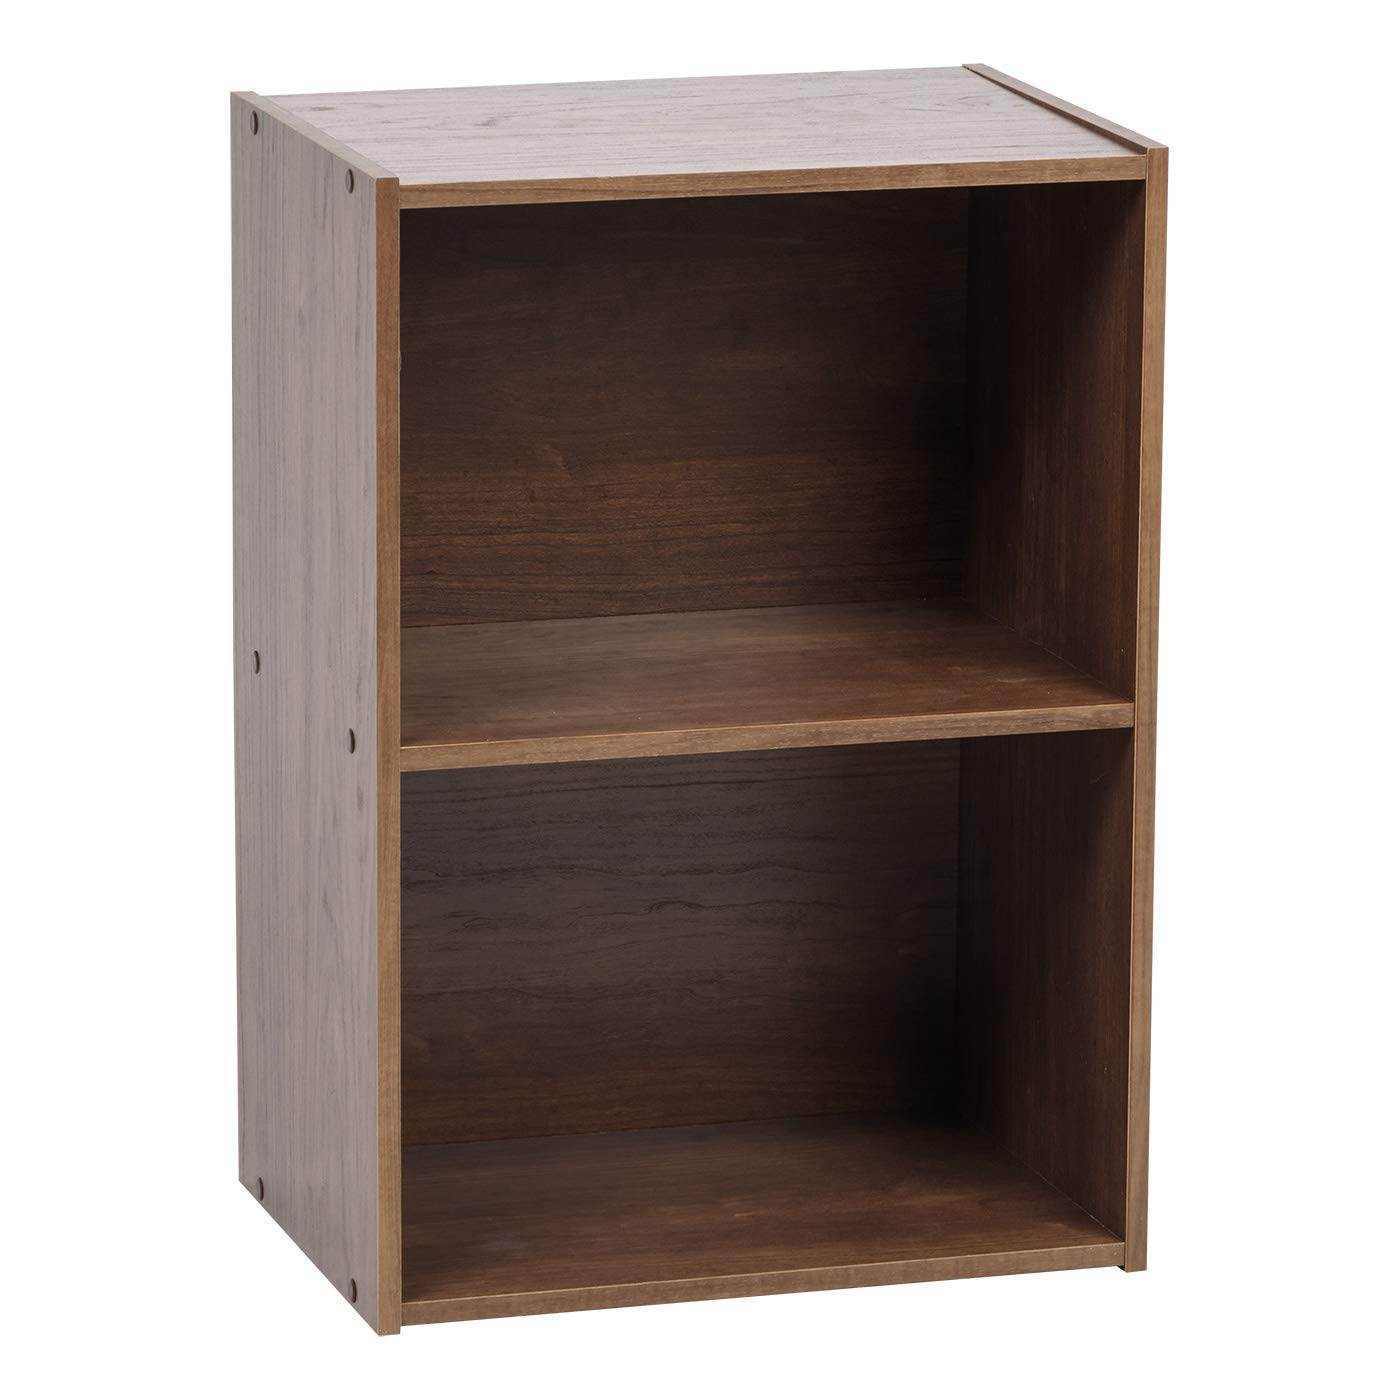 IRIS USA 2-Tier Wood Storage Shelf, Brown